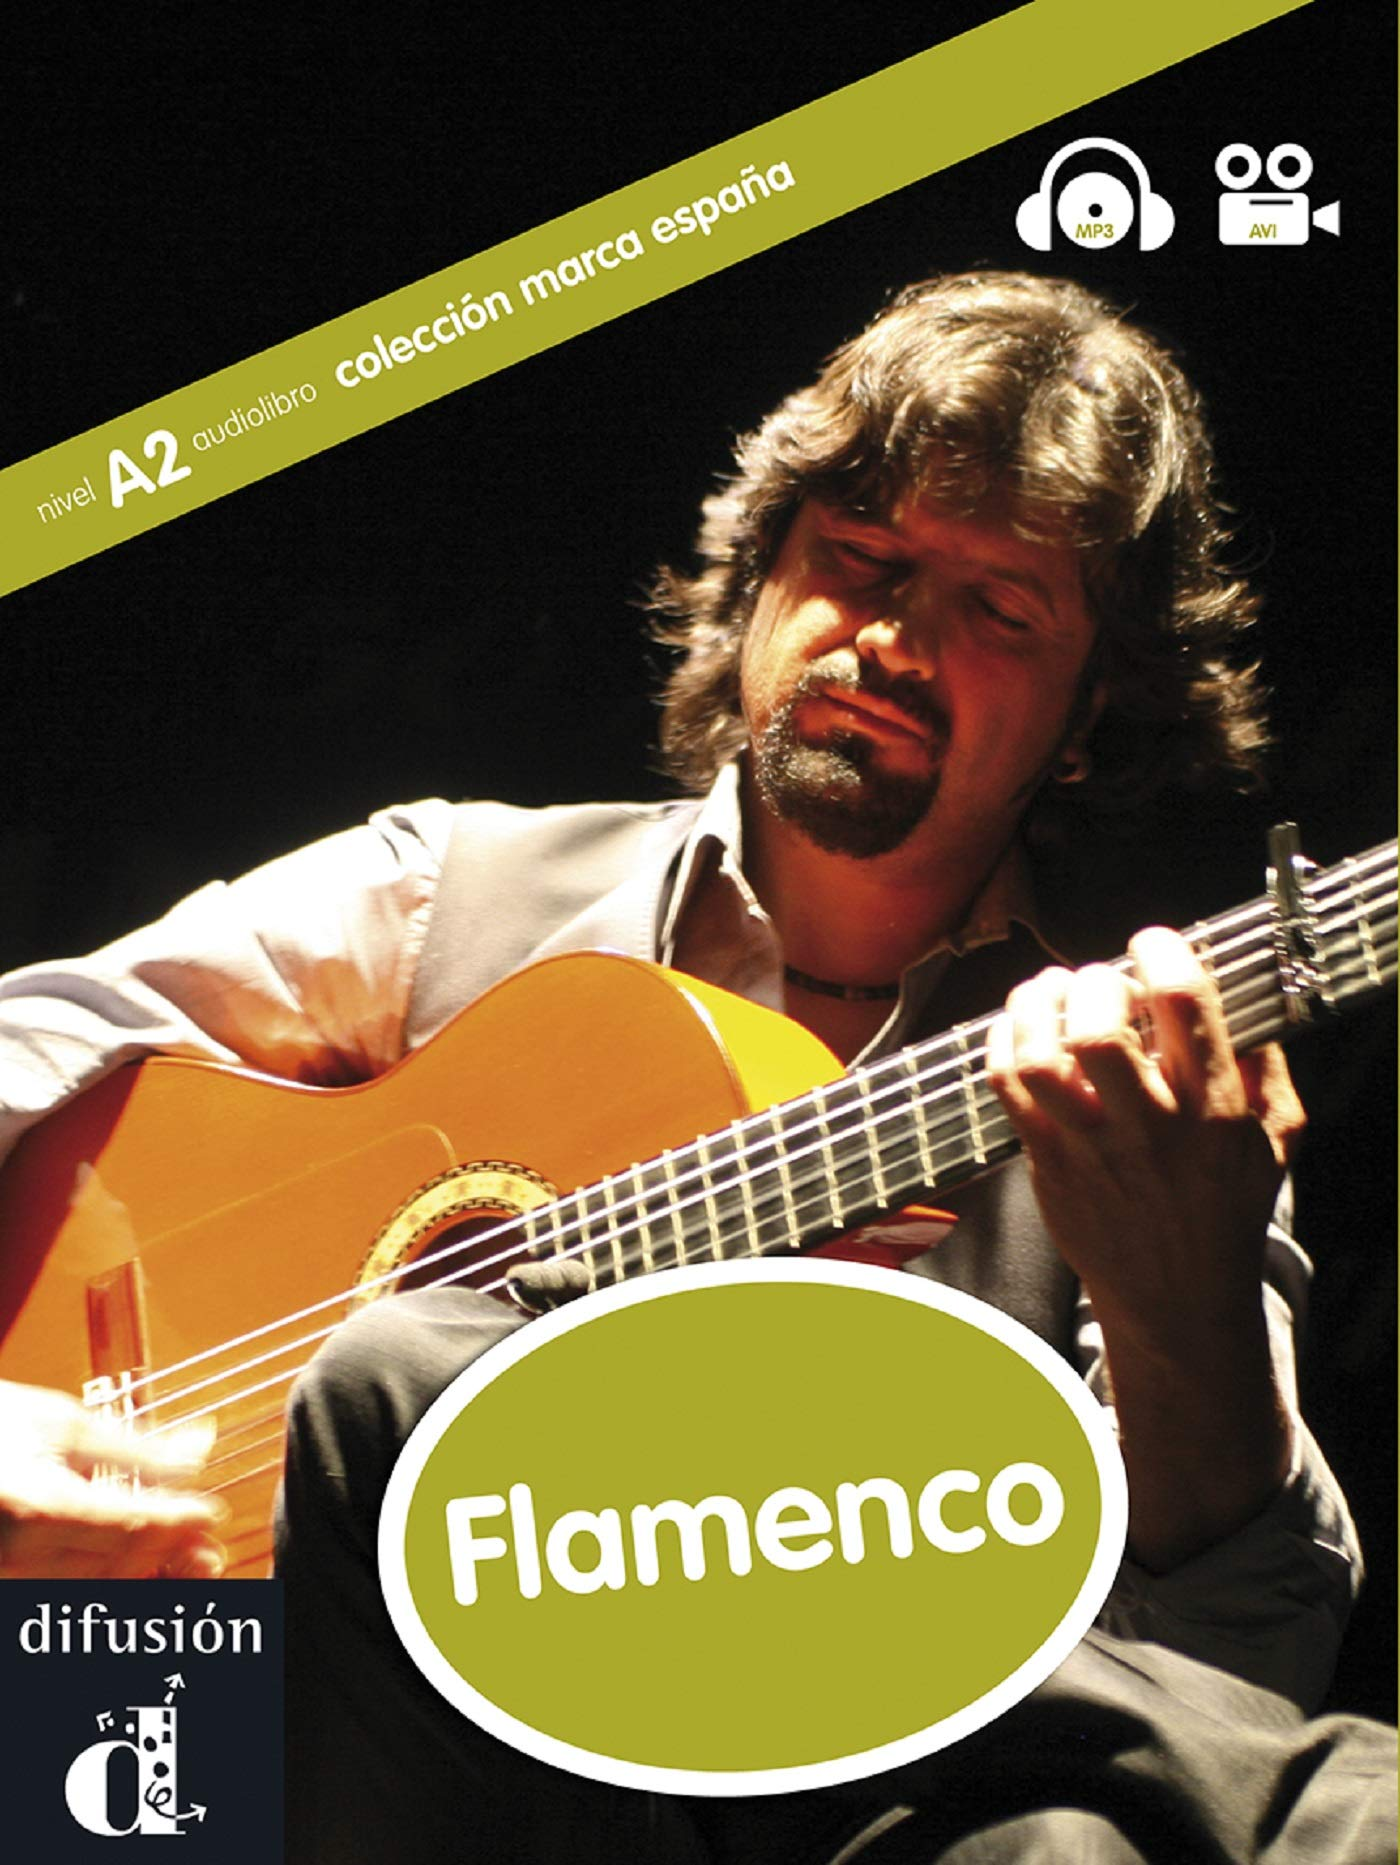 Colección Marca España. Flamenco. Libro + CD: Flamenco, Marca España + CD Ele - Marca España: Amazon.es: de la Flor, Clara: Libros